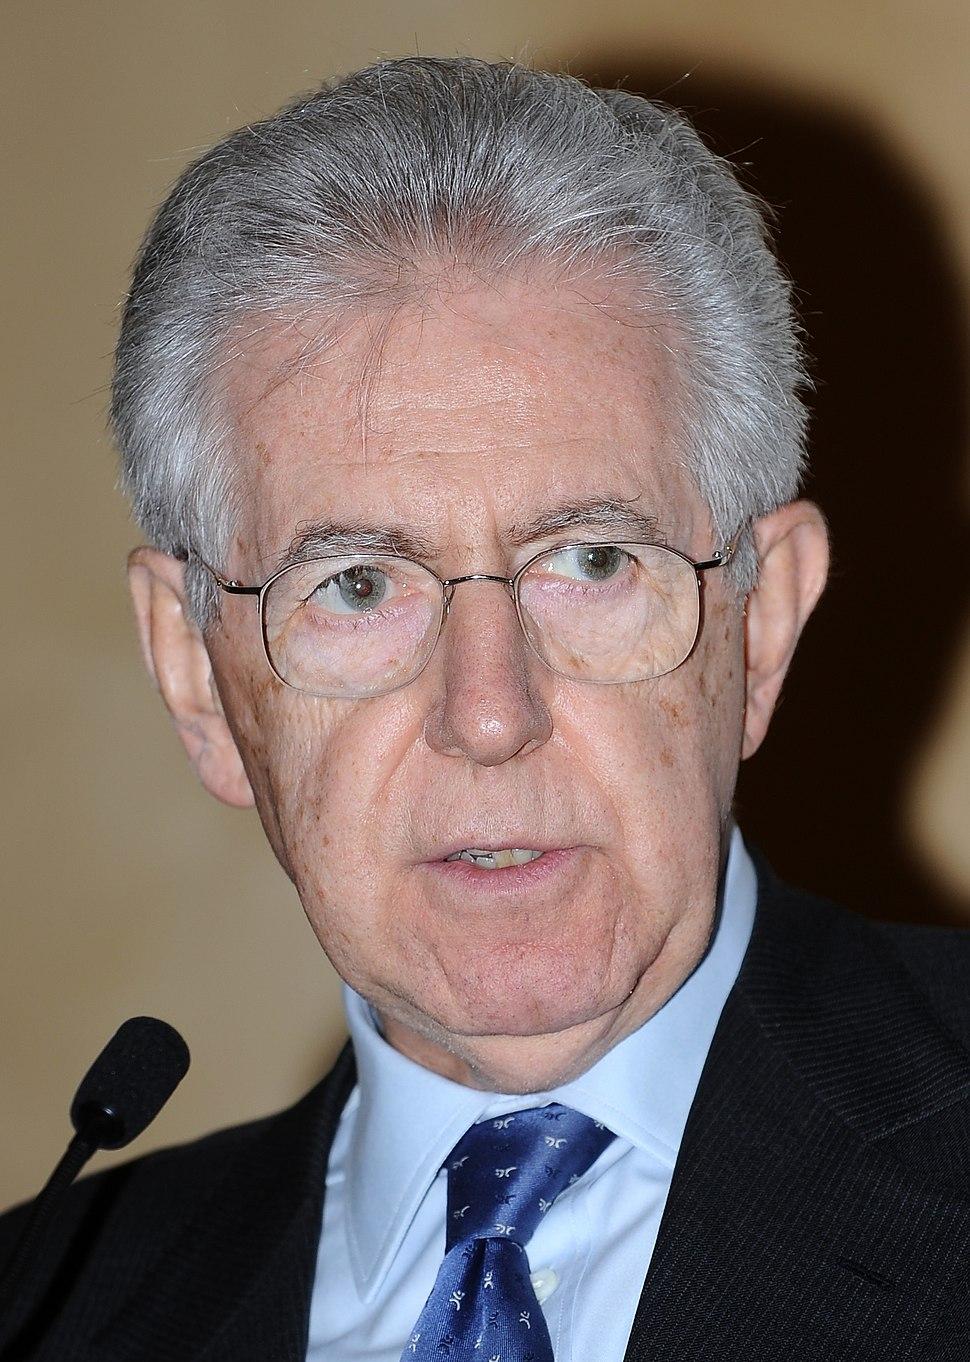 Mario Monti - Terre alte 2013